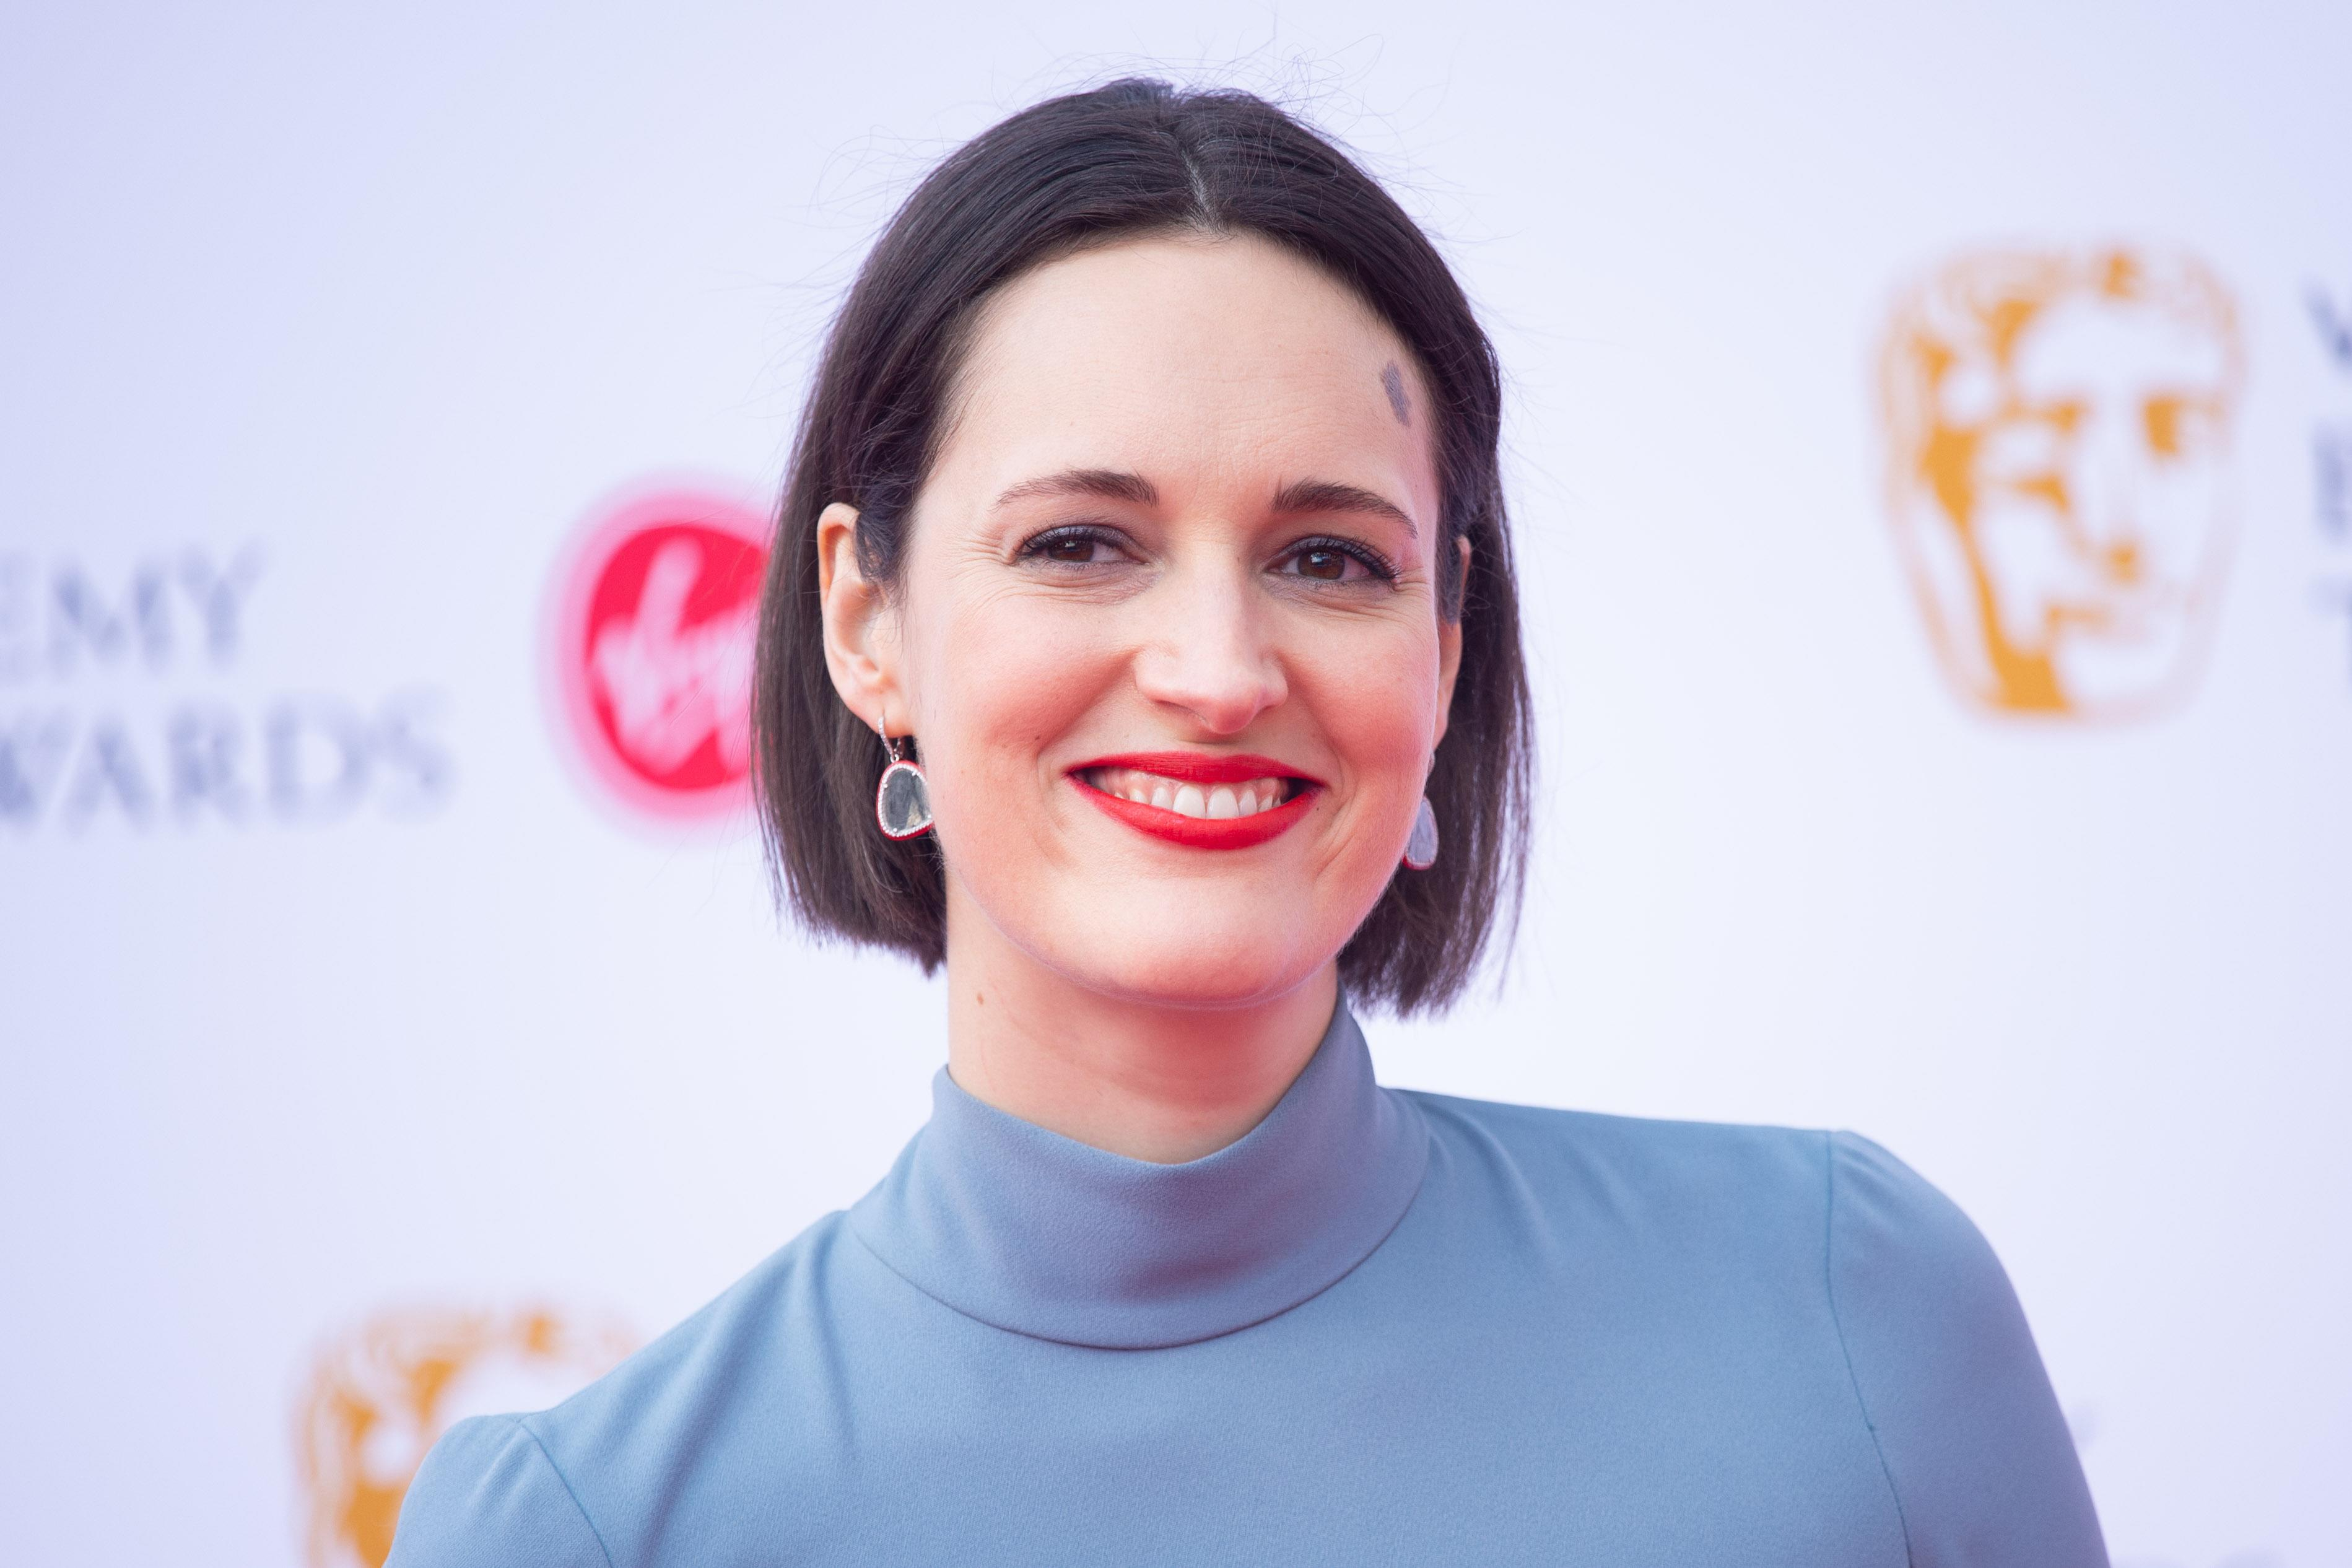 Phoebe Waller-Bridge wants to bring 'Fleabag' back when she's 50